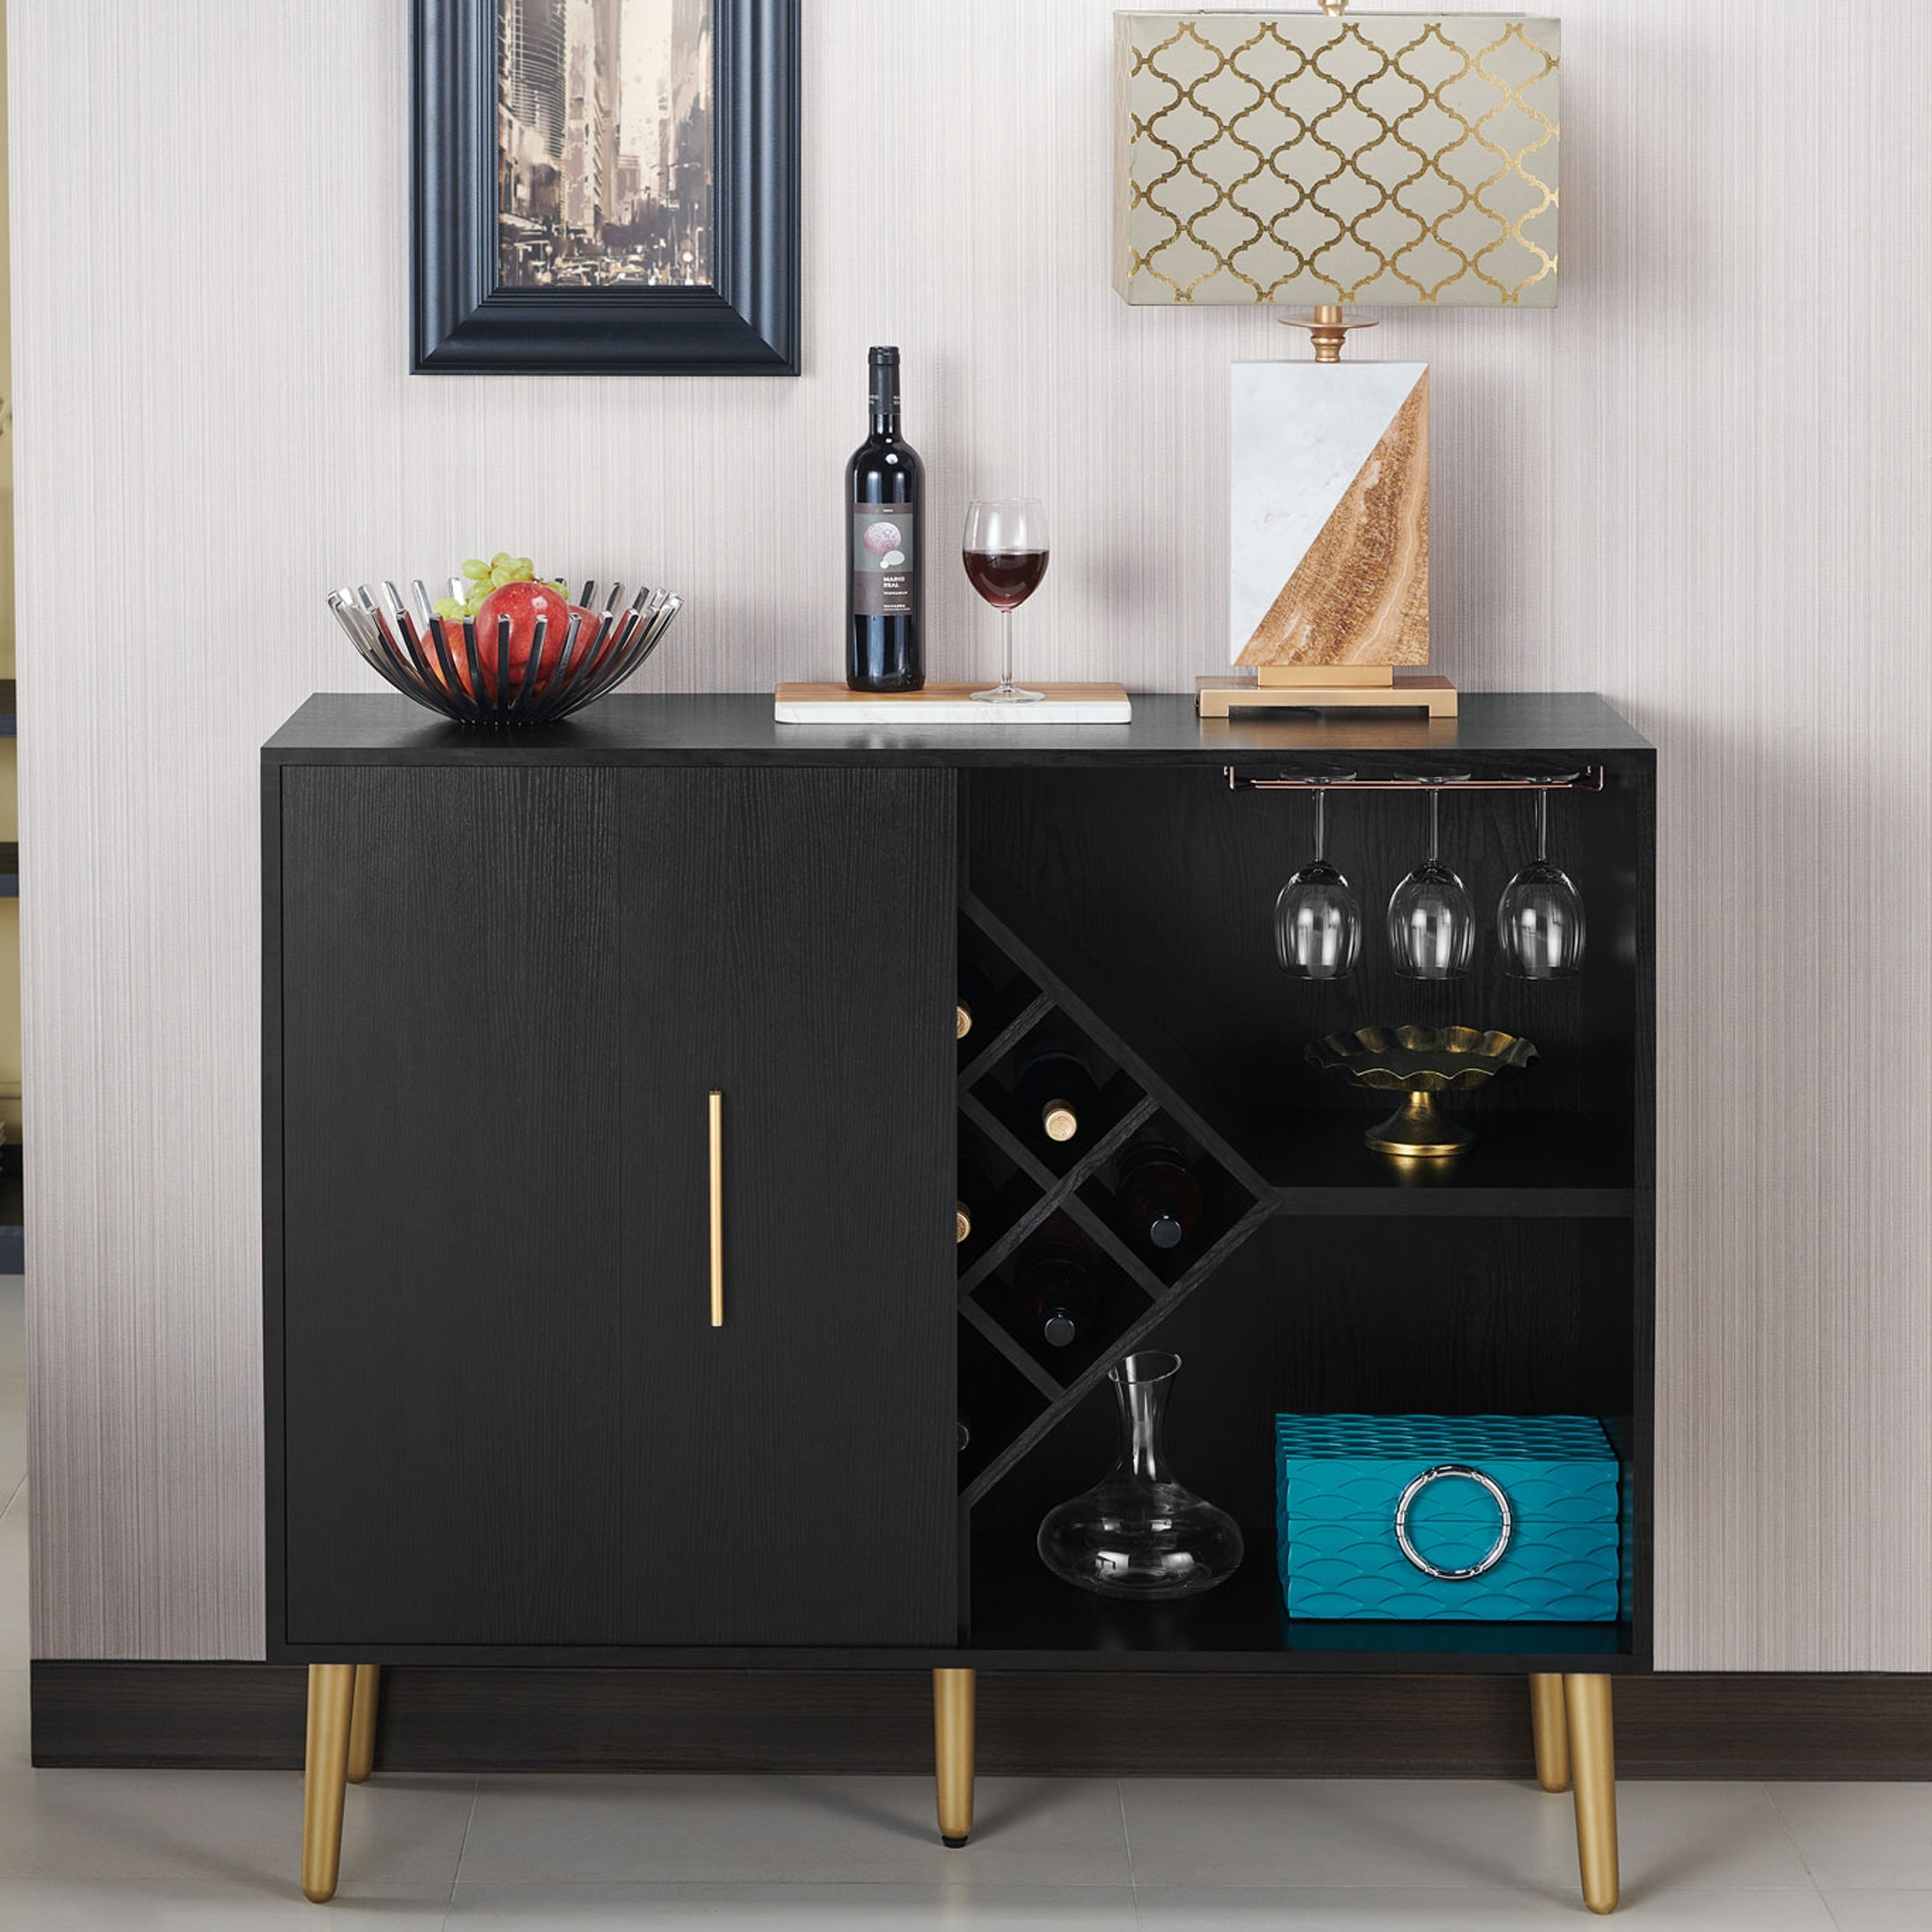 Furniture of america zeta modern black storage buffet with wine rack